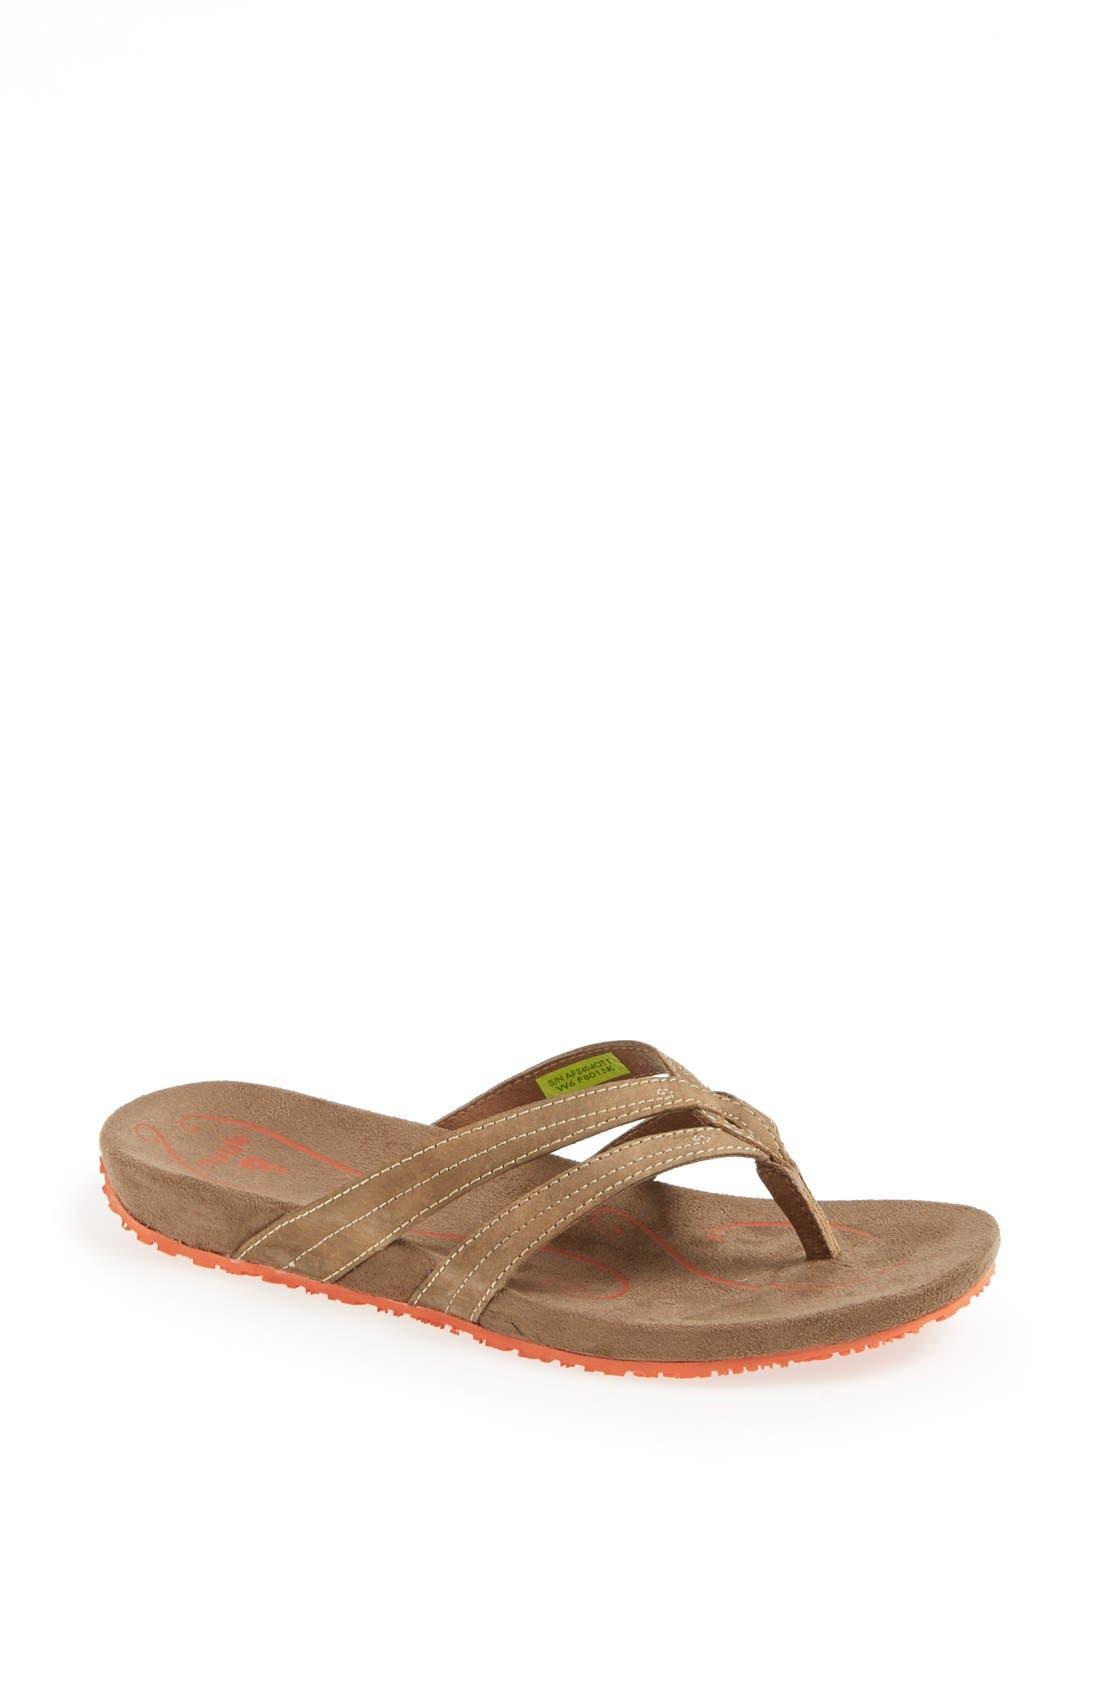 Alternate Image 1 Selected - Ahnu 'Hanaa' Sandal